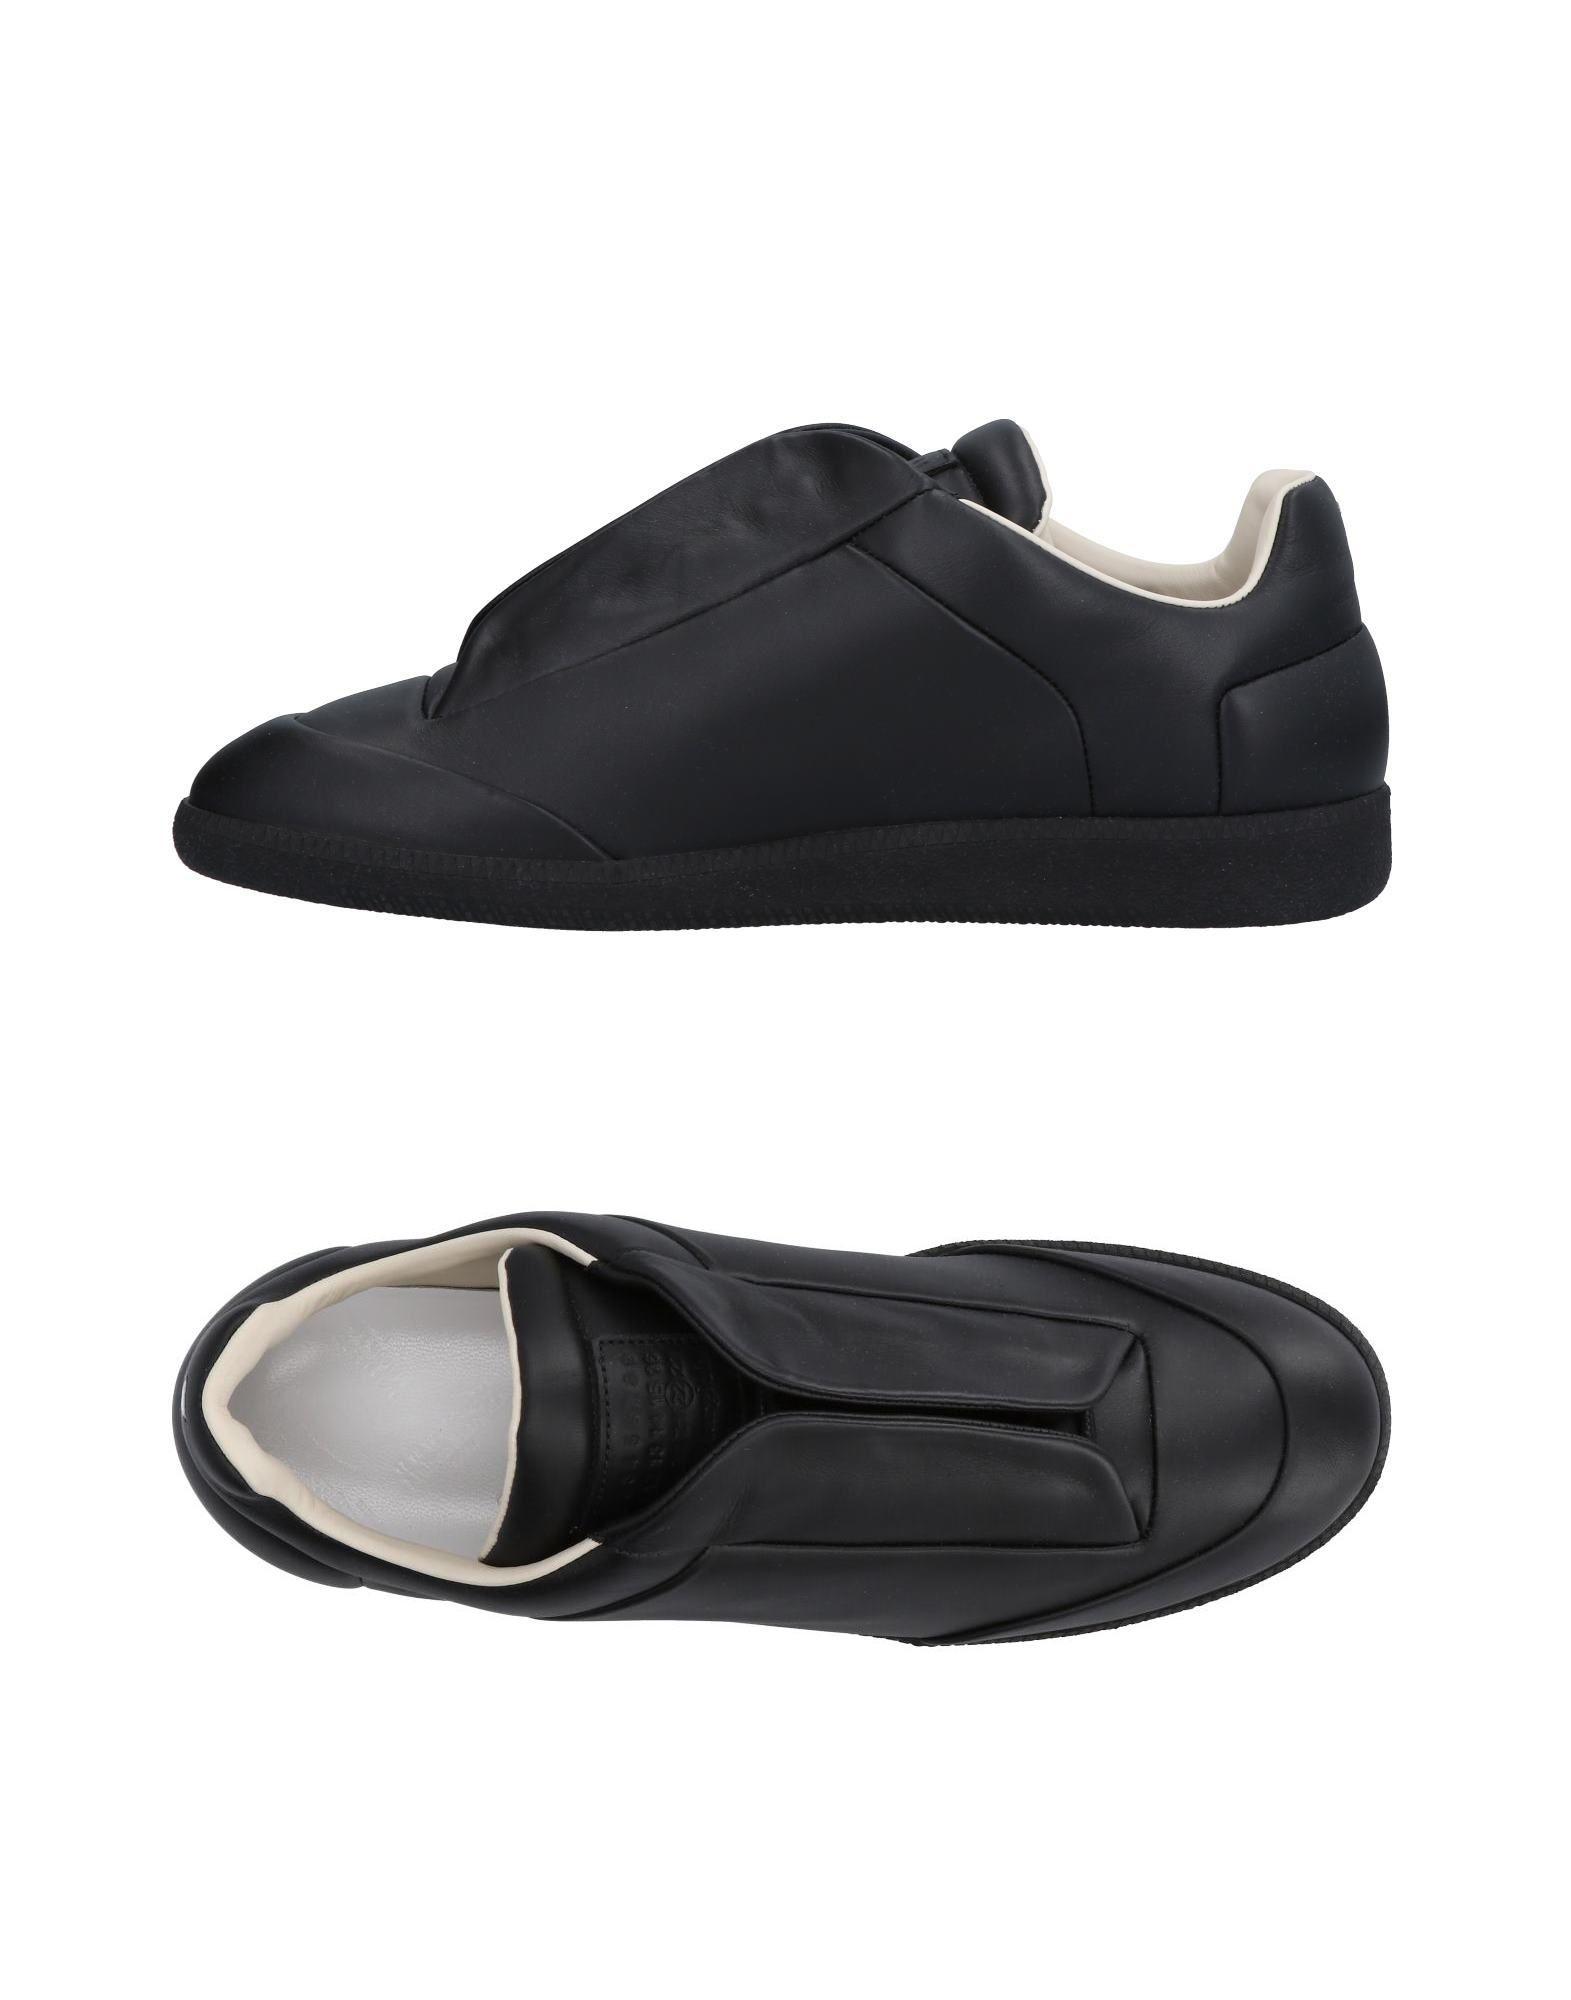 Maison Margiela Sneakers Herren  11471987AC Gute Qualität beliebte Schuhe